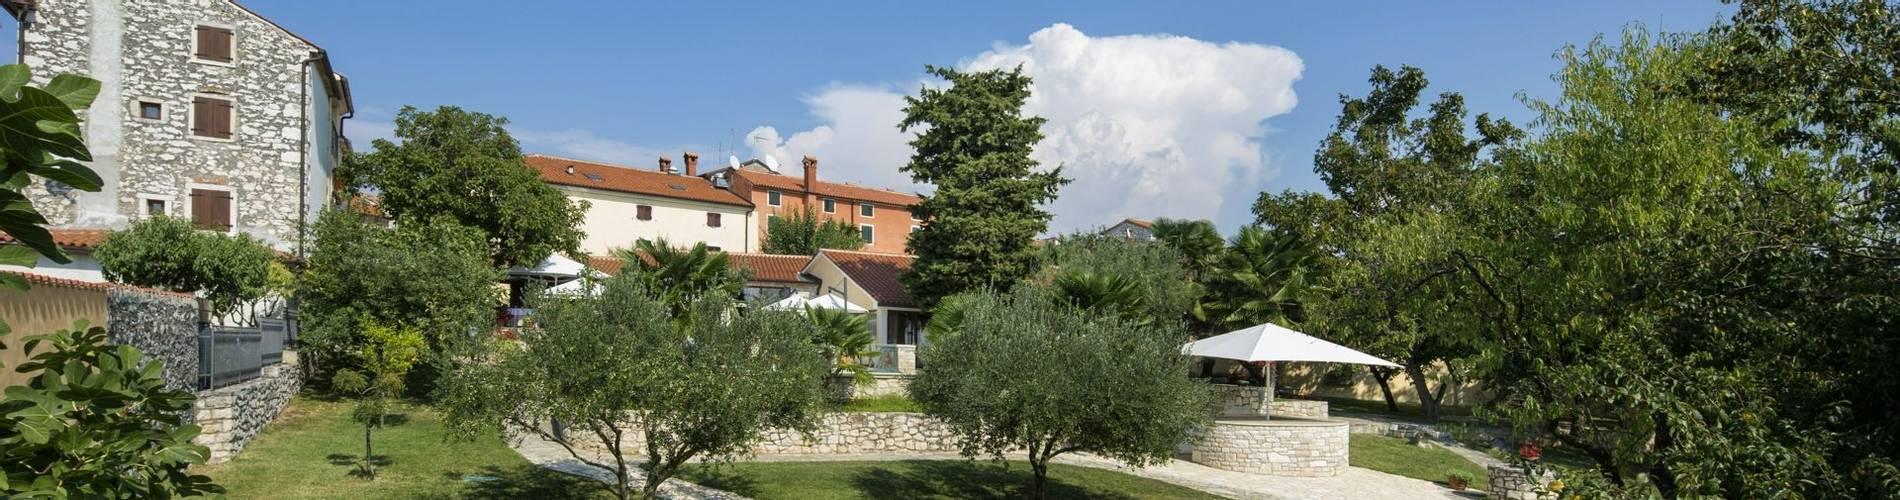 Heritage Hotel San Rocco, Istra, Croatia (4).jpg